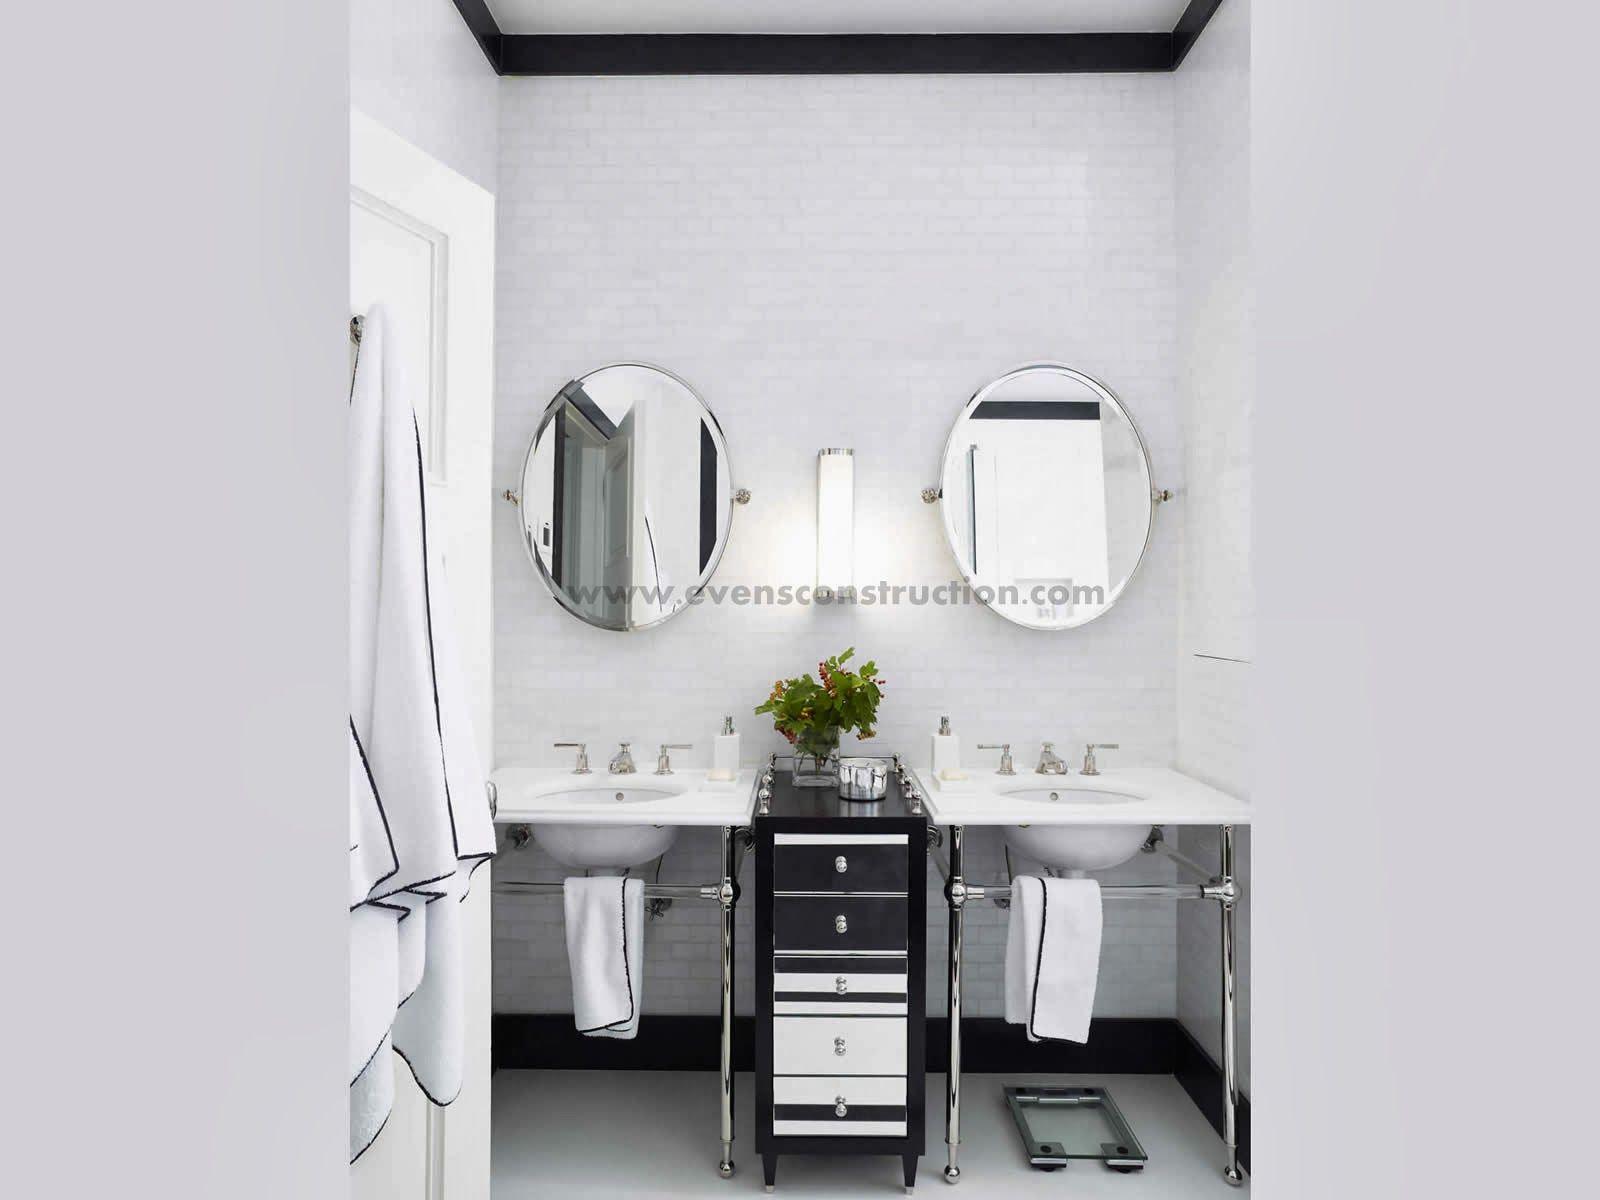 Traditional bathroom sink - Bowl Sinks Fabulous Design Long Retro Pedestal Sink Vanity With Faucet Hole Traditional Bathroom Vanities And